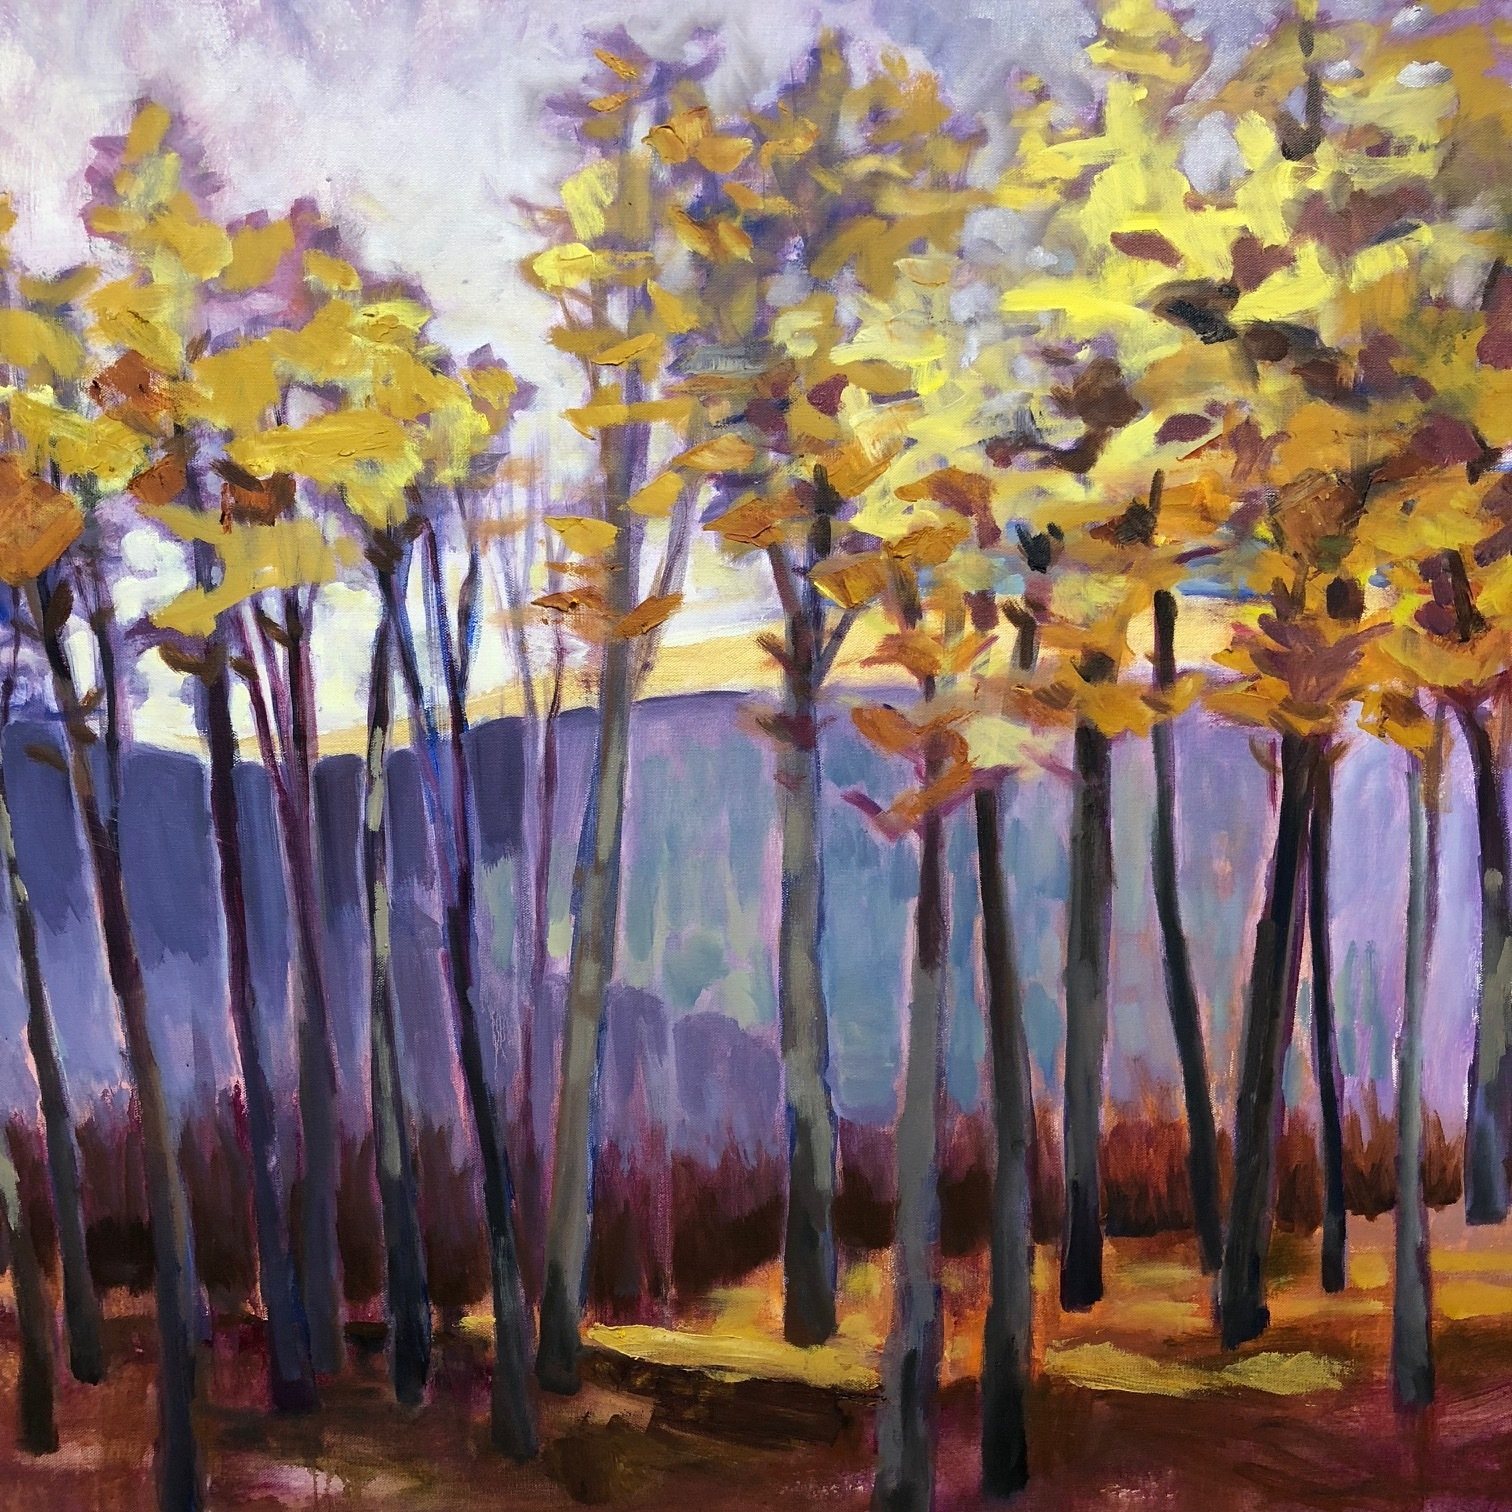 "Glorious, 36"" x 36"", Oil on Canvas"